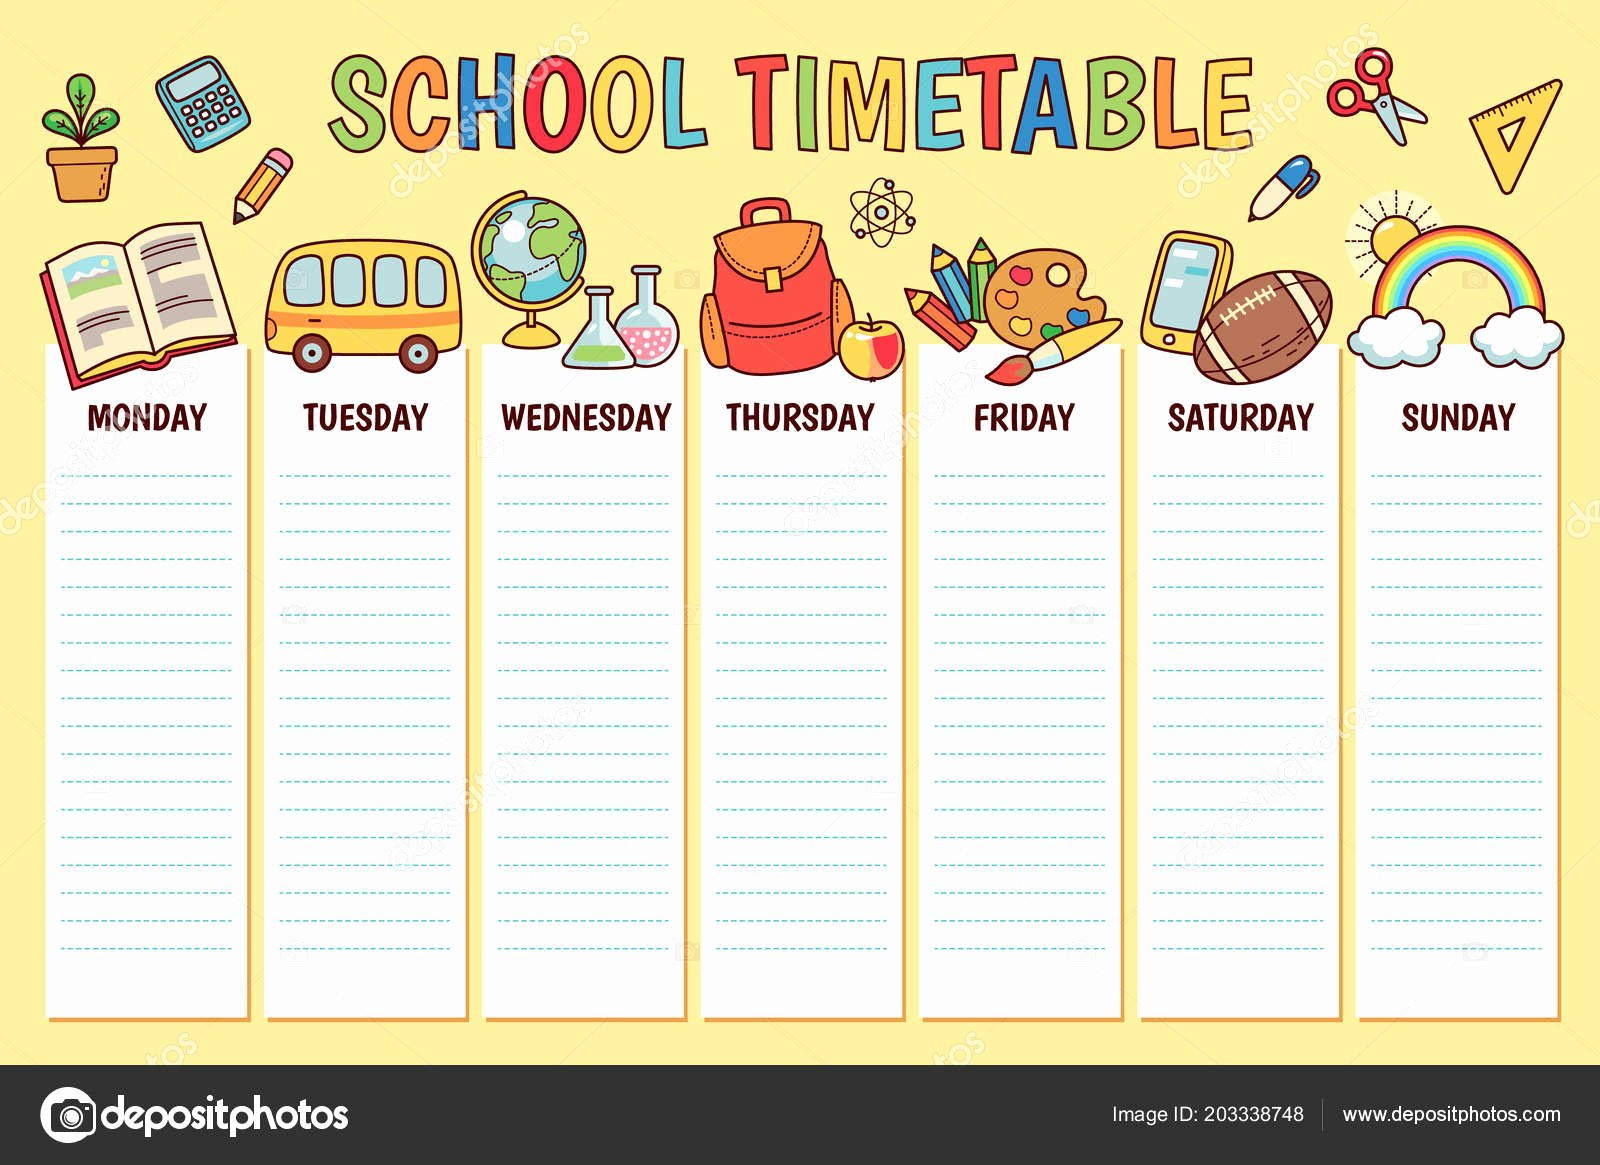 Sunday School Schedule Template Fresh Timetable Elementary School Weekly Planner Template